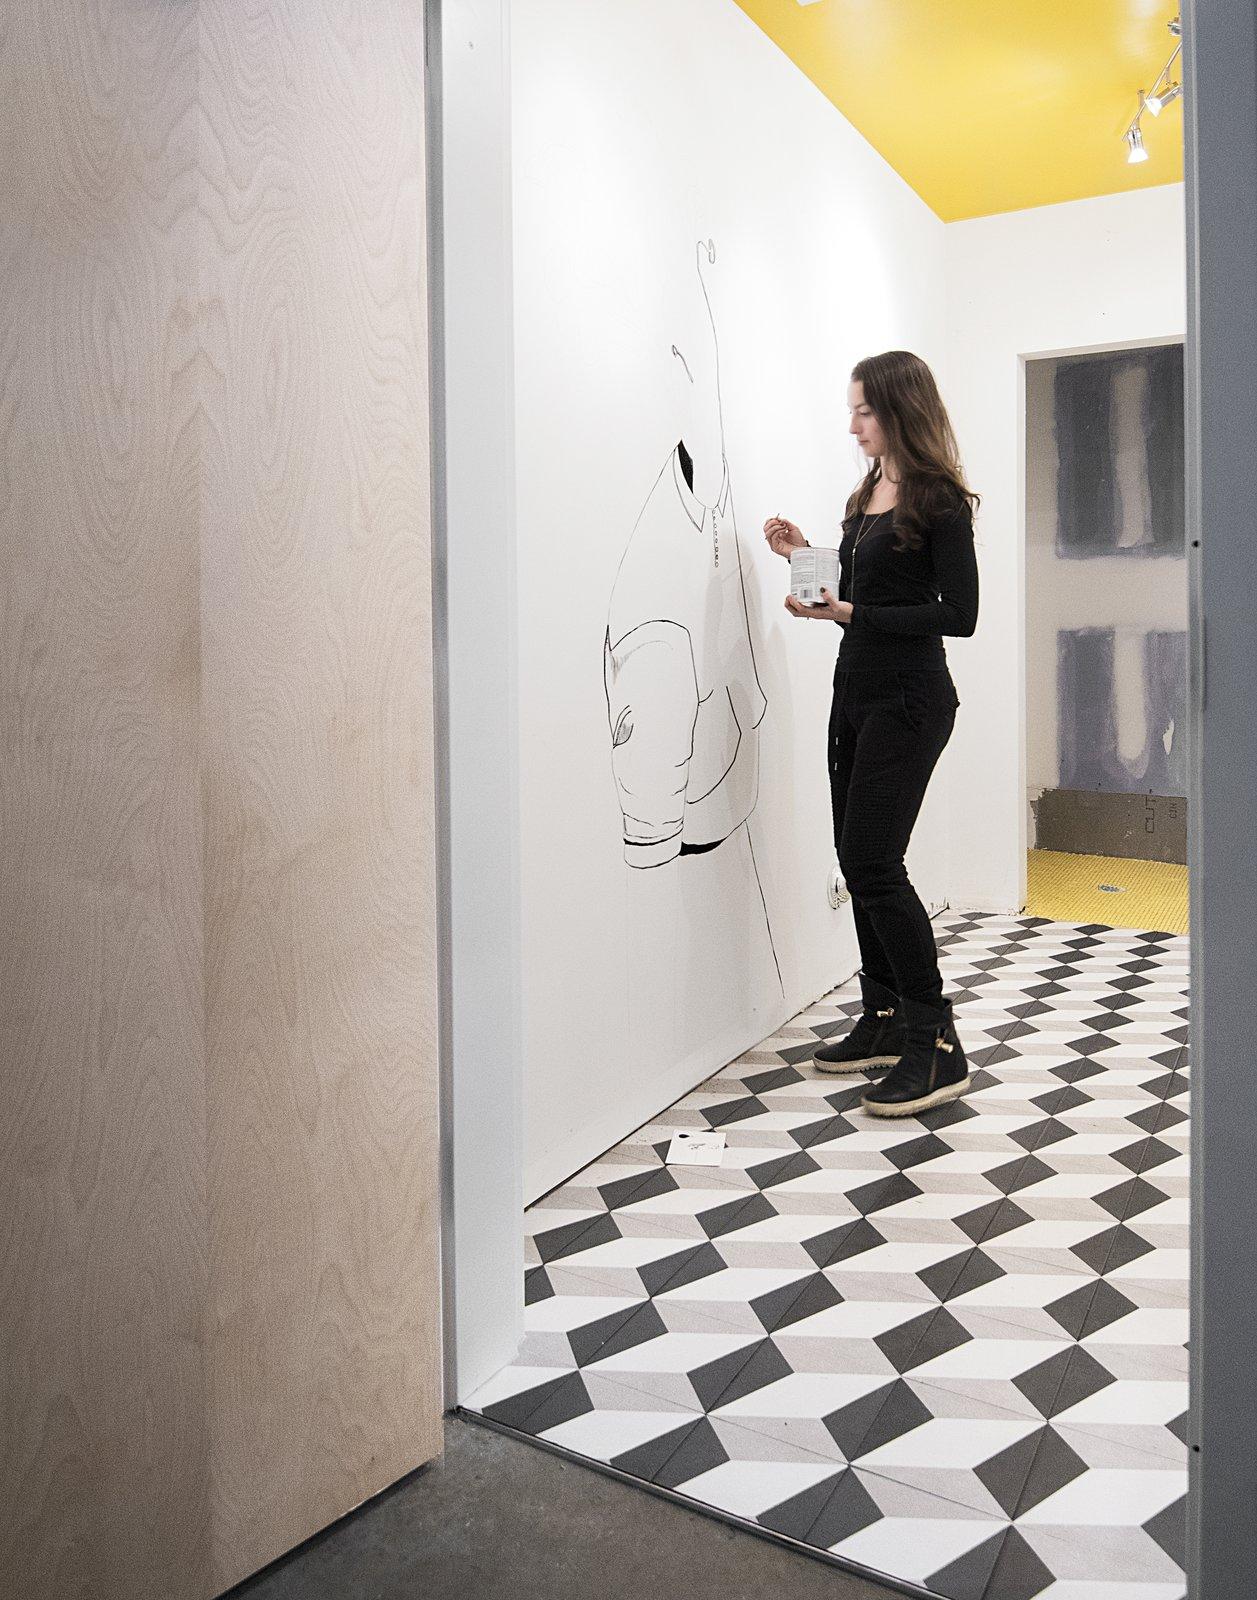 artist Gabrielle Bates Stahlman (Liesa Cole's daughter) painting a poetry comic mural in the studio bathroom  Studio GoodLight by Liesa Cole